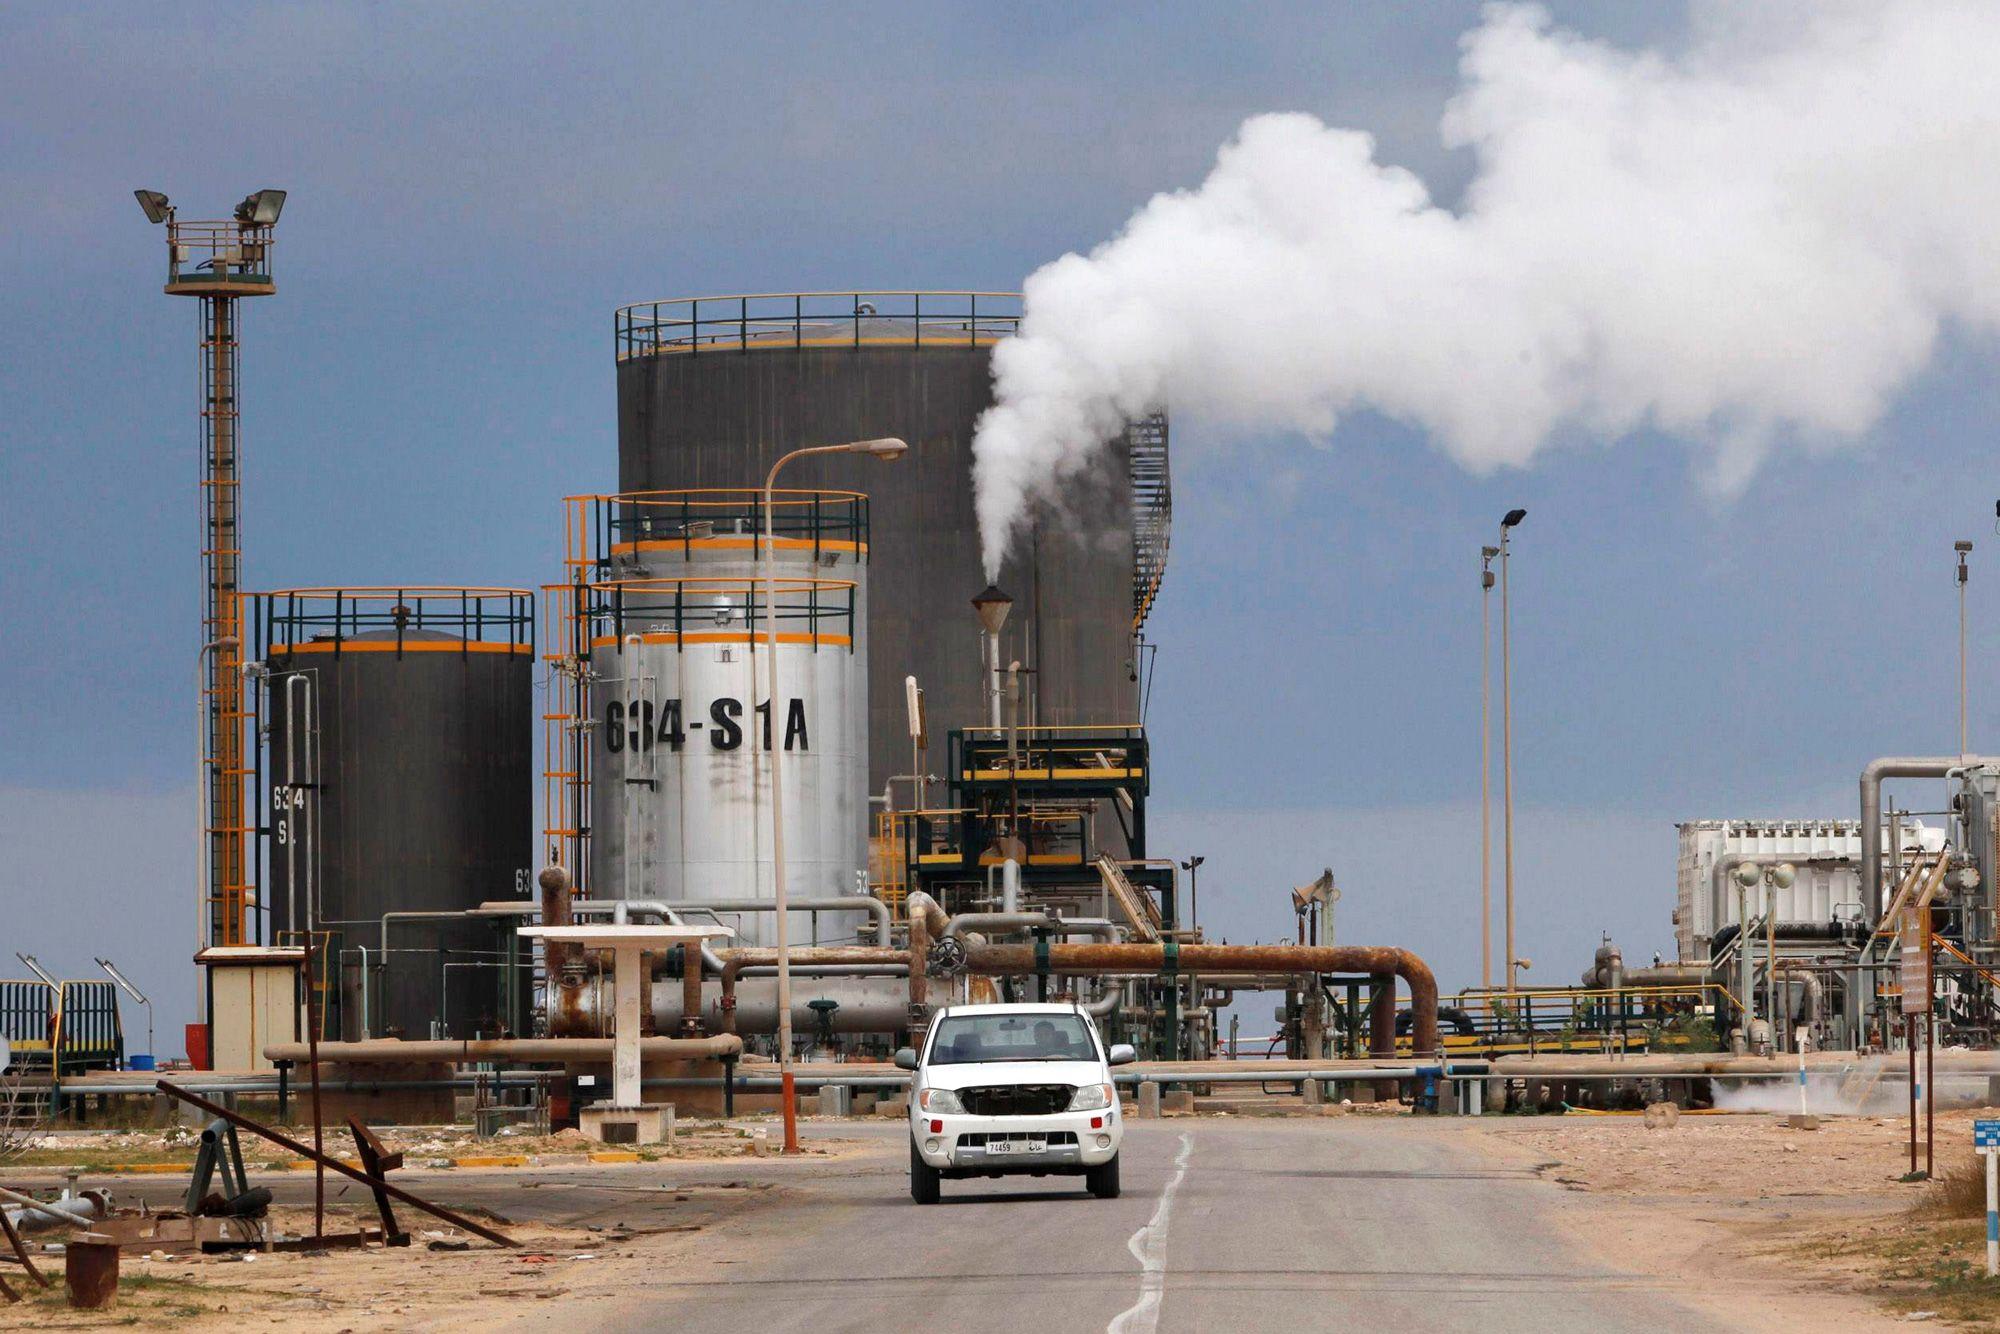 Libya could mark next major supply shock, analysts warn ...